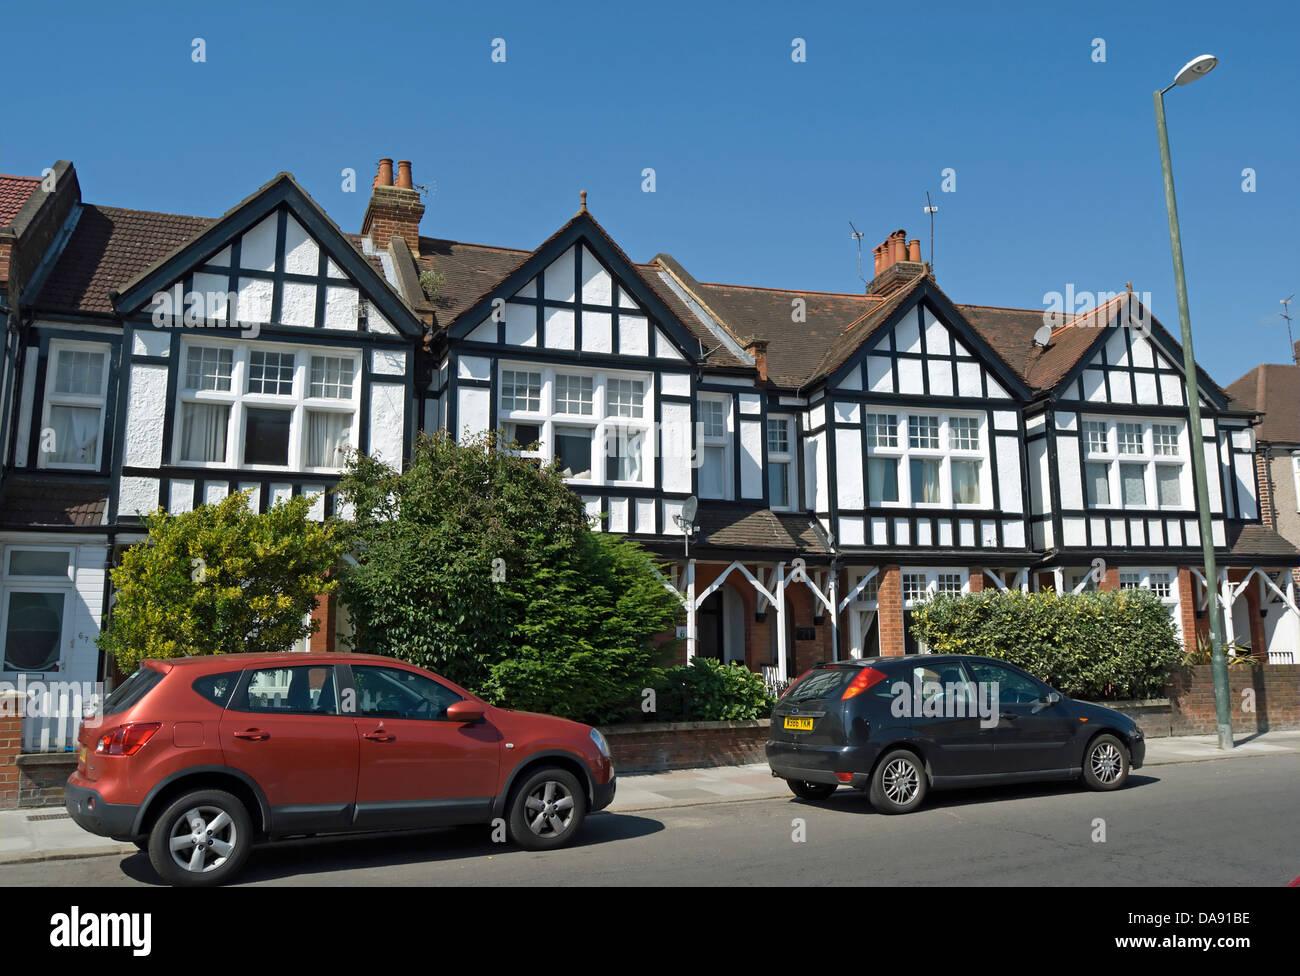 row of mock tudor houses  in teddington, middlesex, england - Stock Image